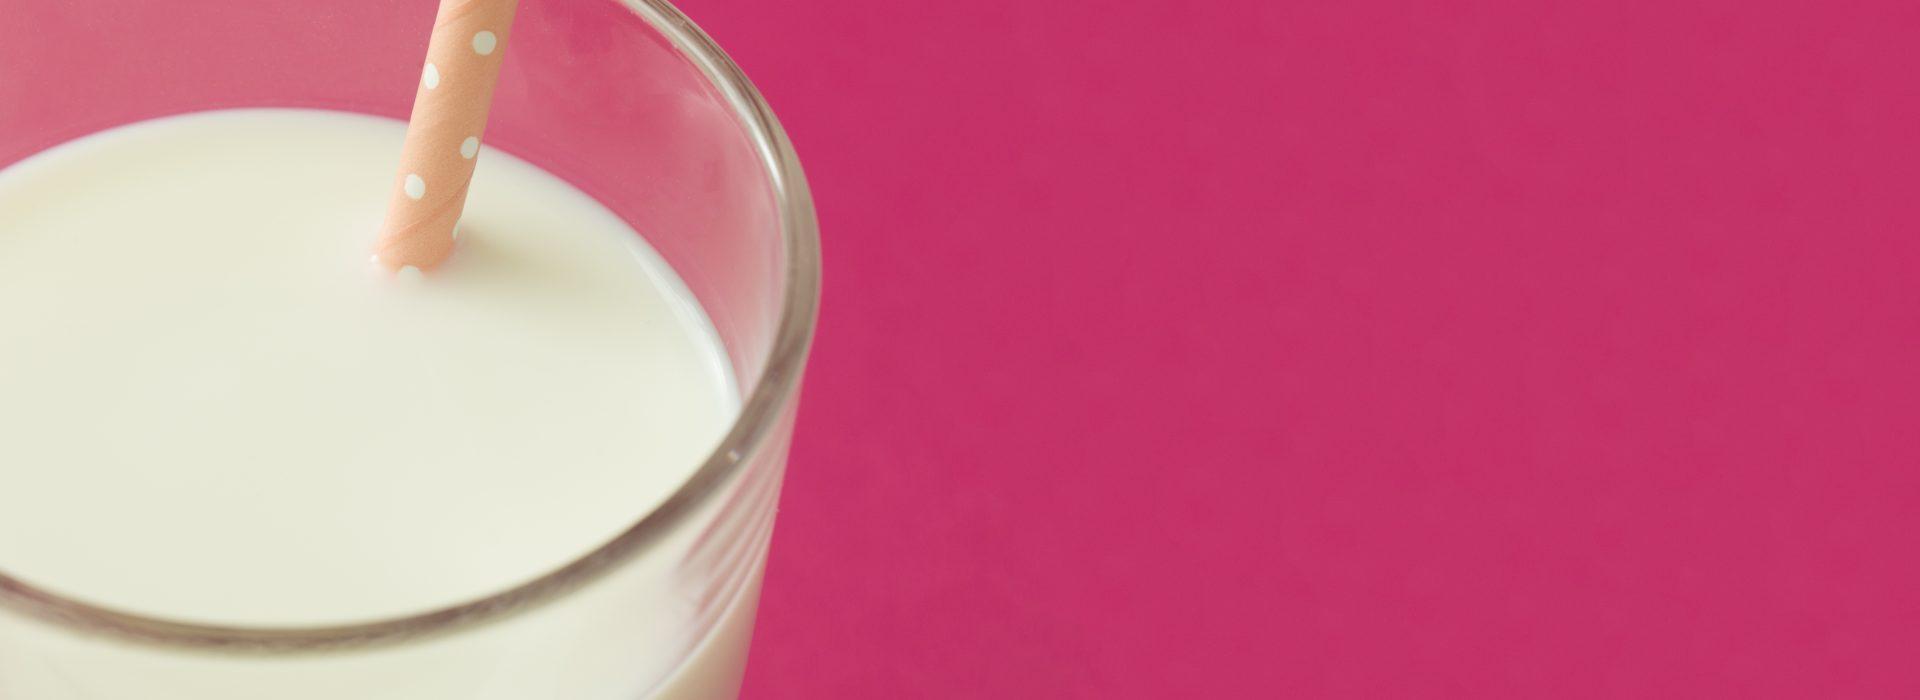 Vaso de leche.